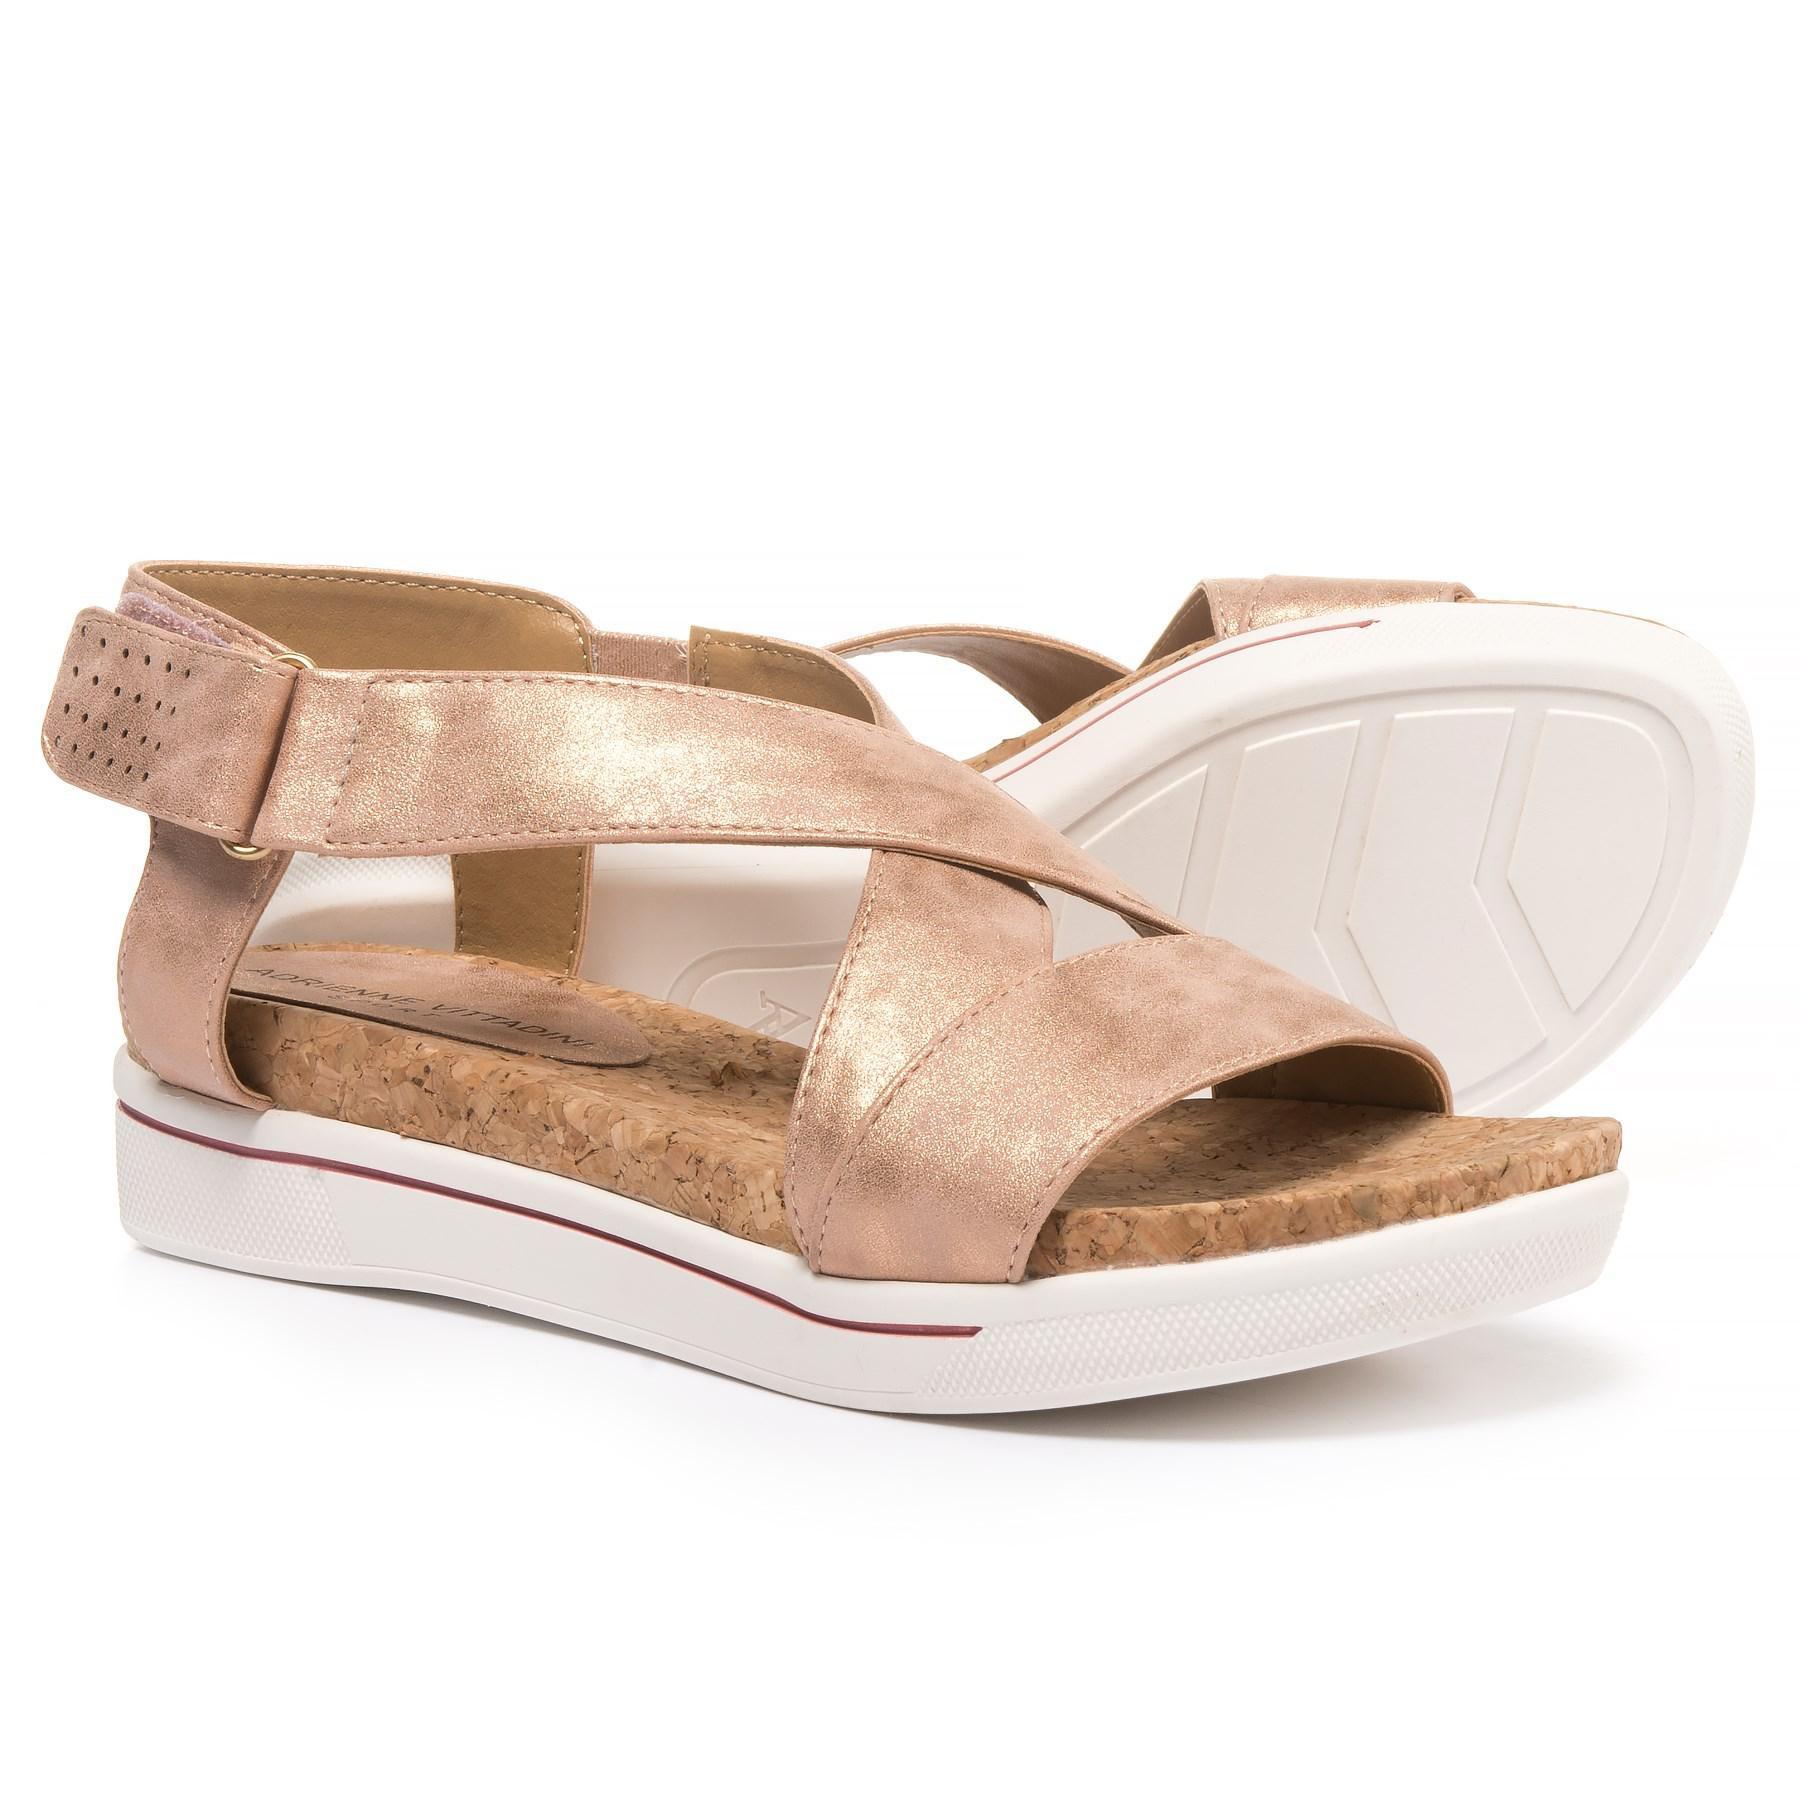 c0c3a3b661fb Lyst - Adrienne Vittadini Sport Celie Sandals in Metallic